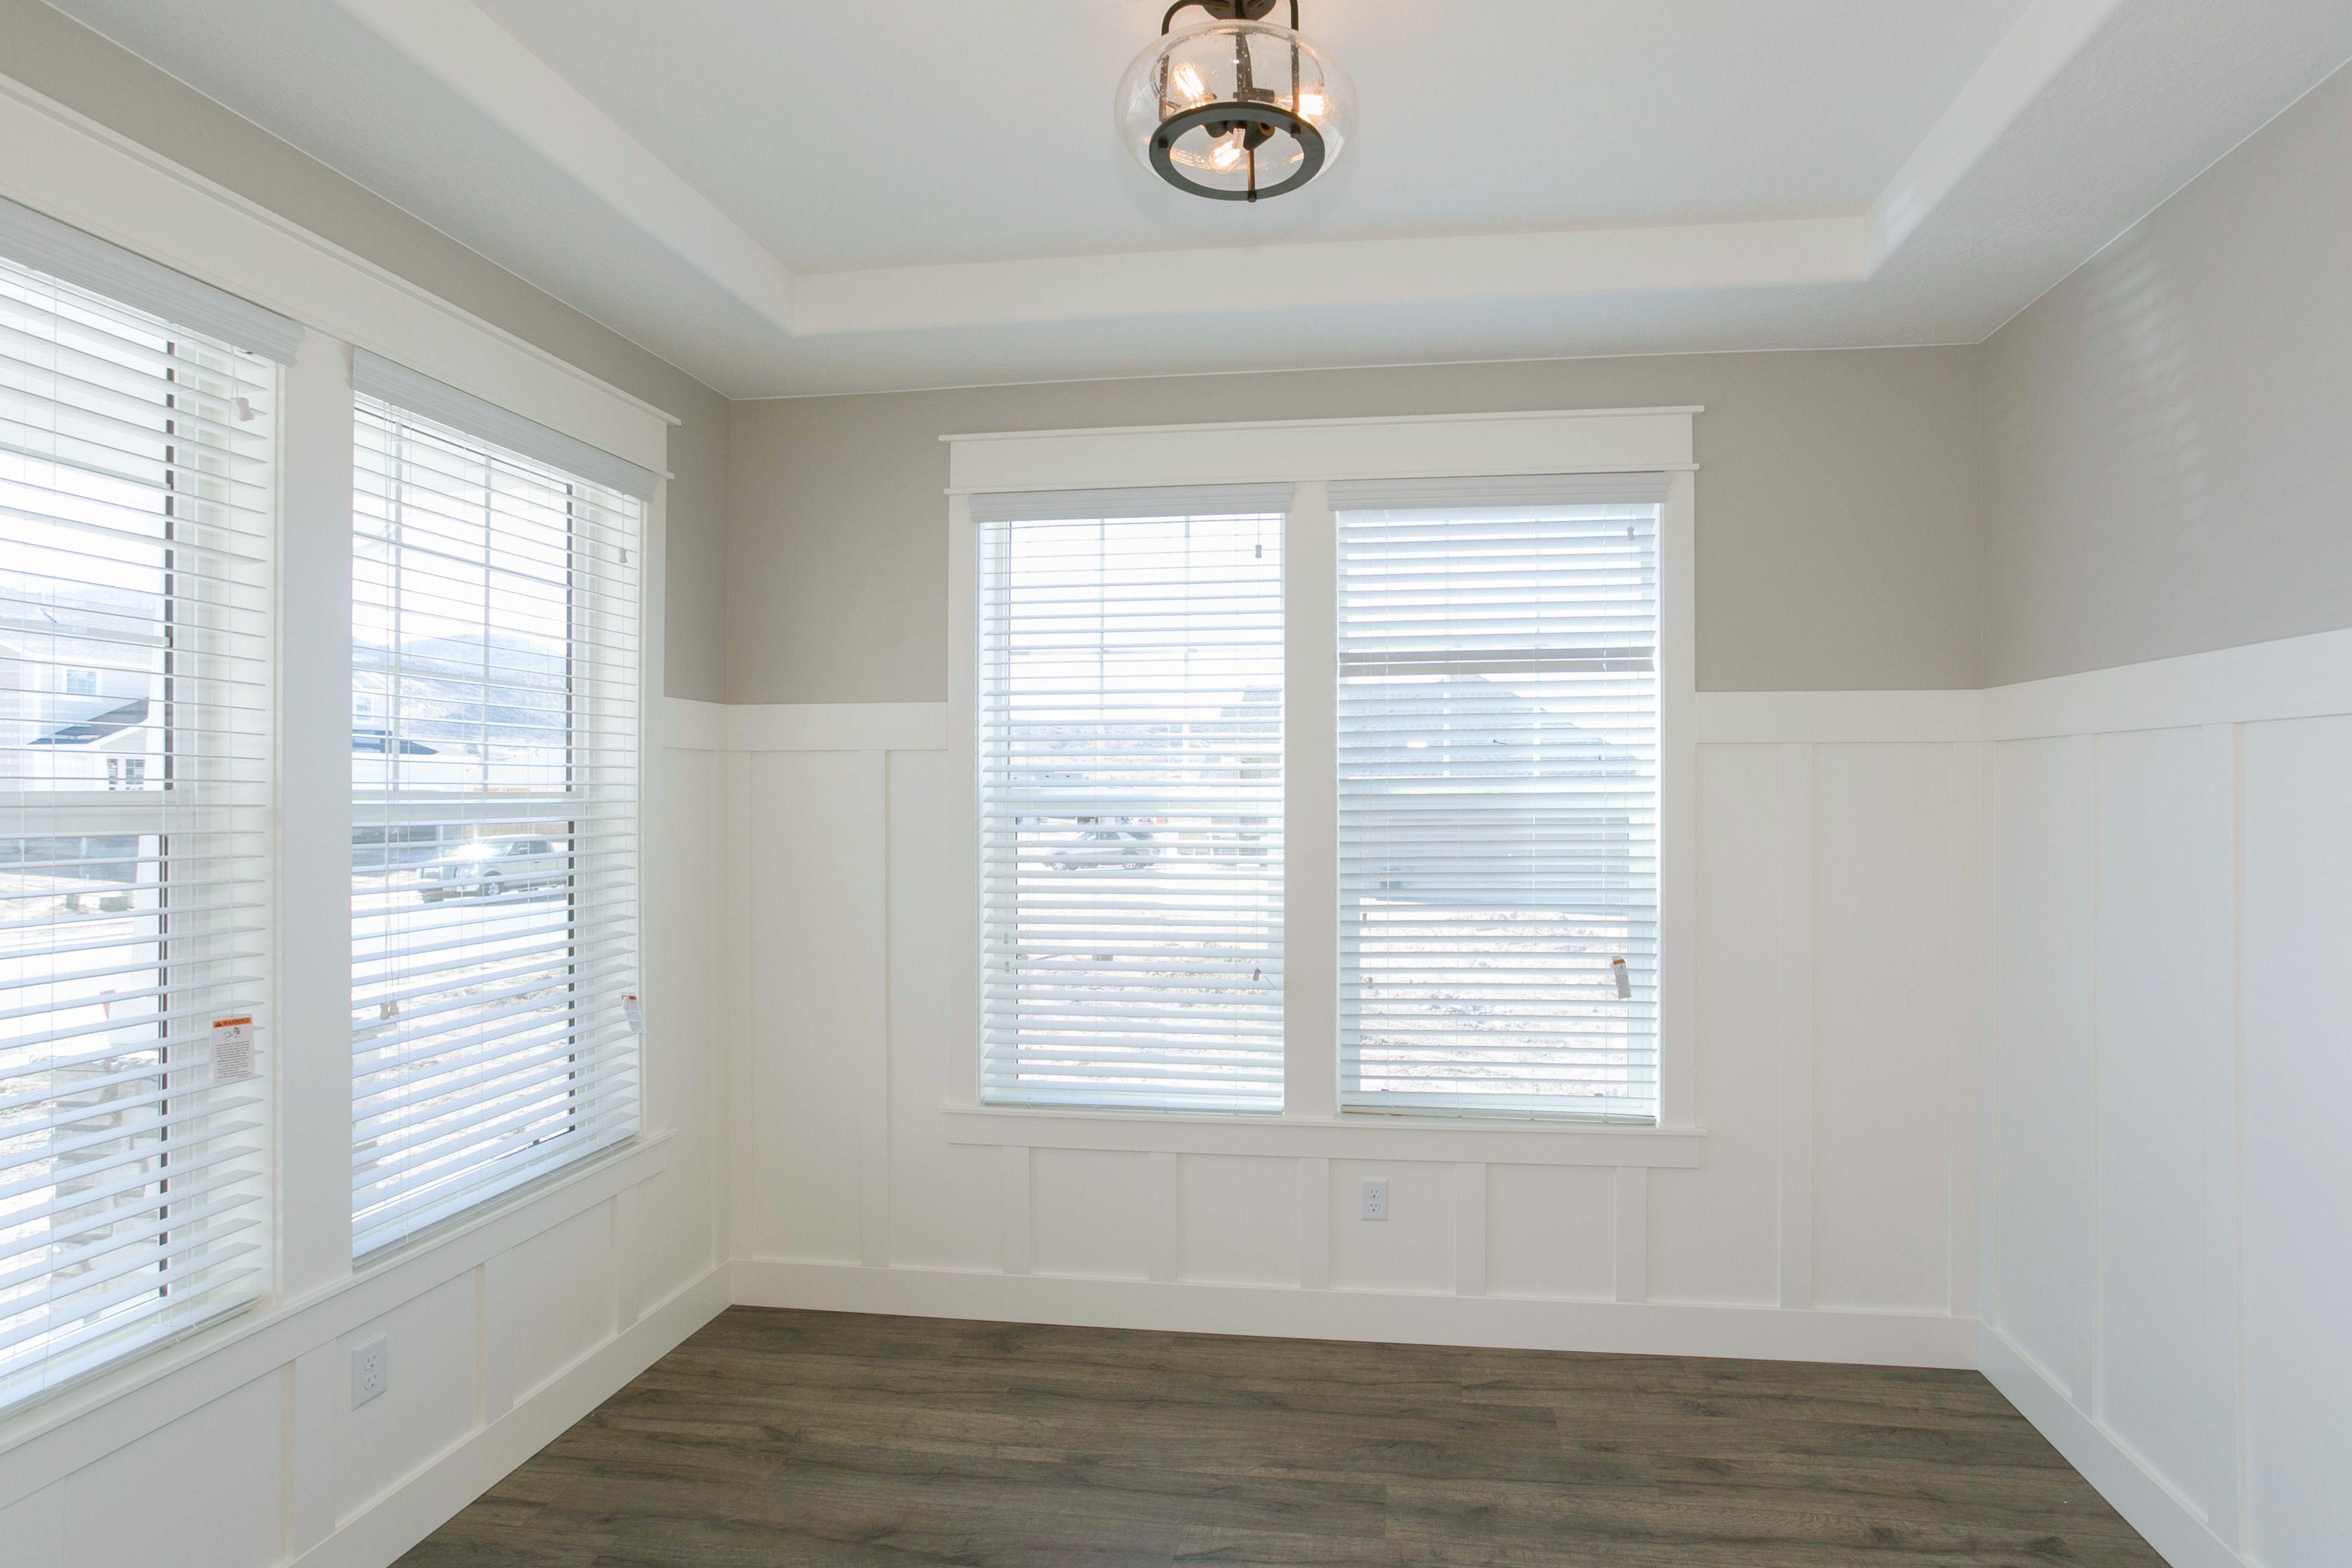 Kitchen window molding  arive homes  board u batten wall treatment arivehomes